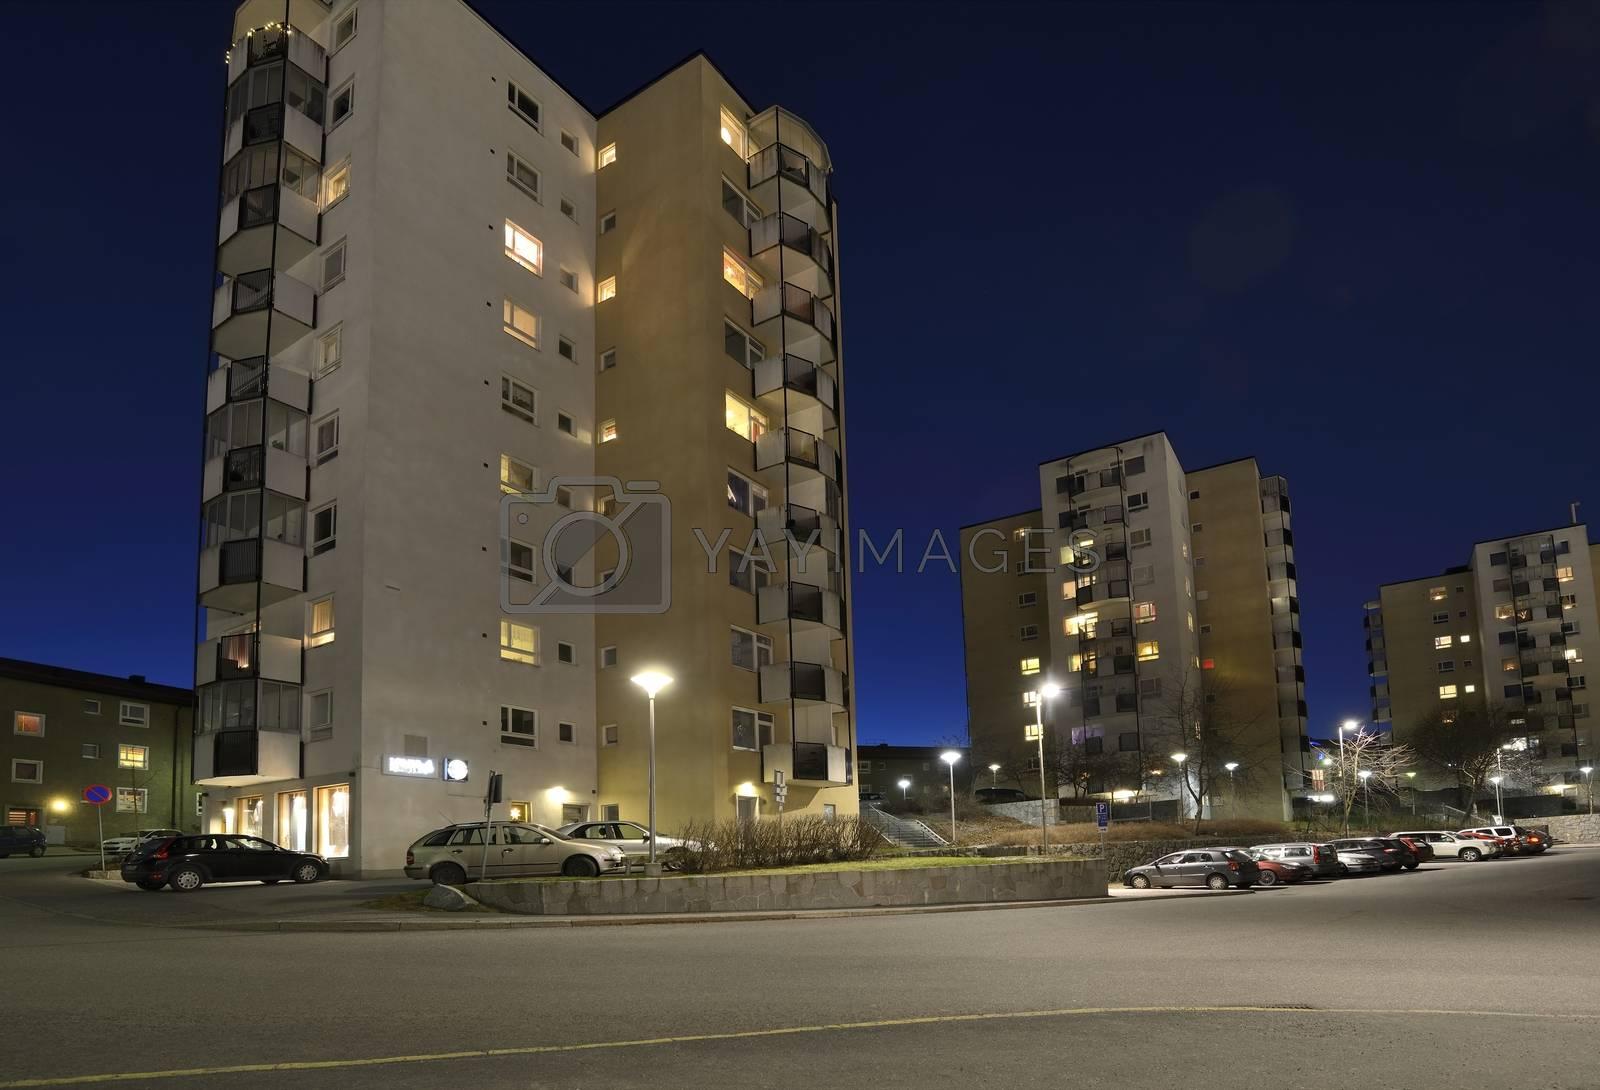 Apartment building in Liljeholmen, a part of Stockholm.